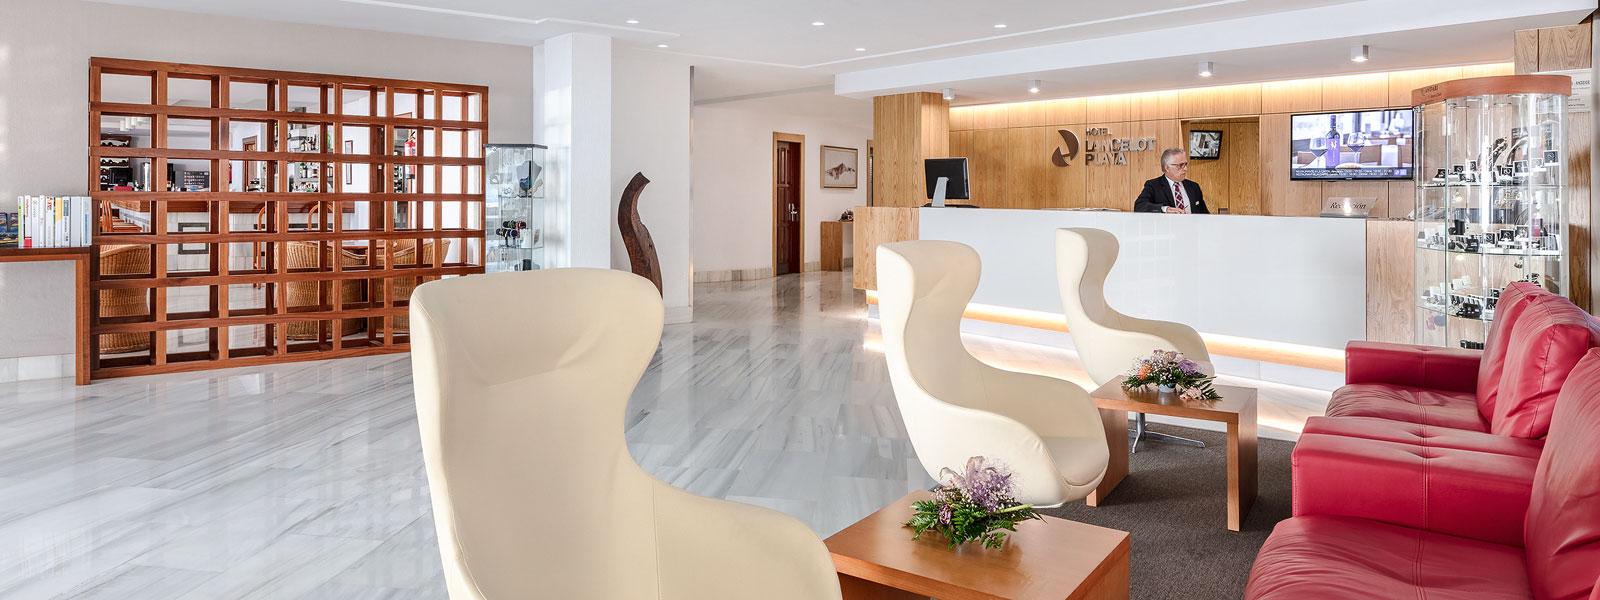 hotel-lancelot-recepcion